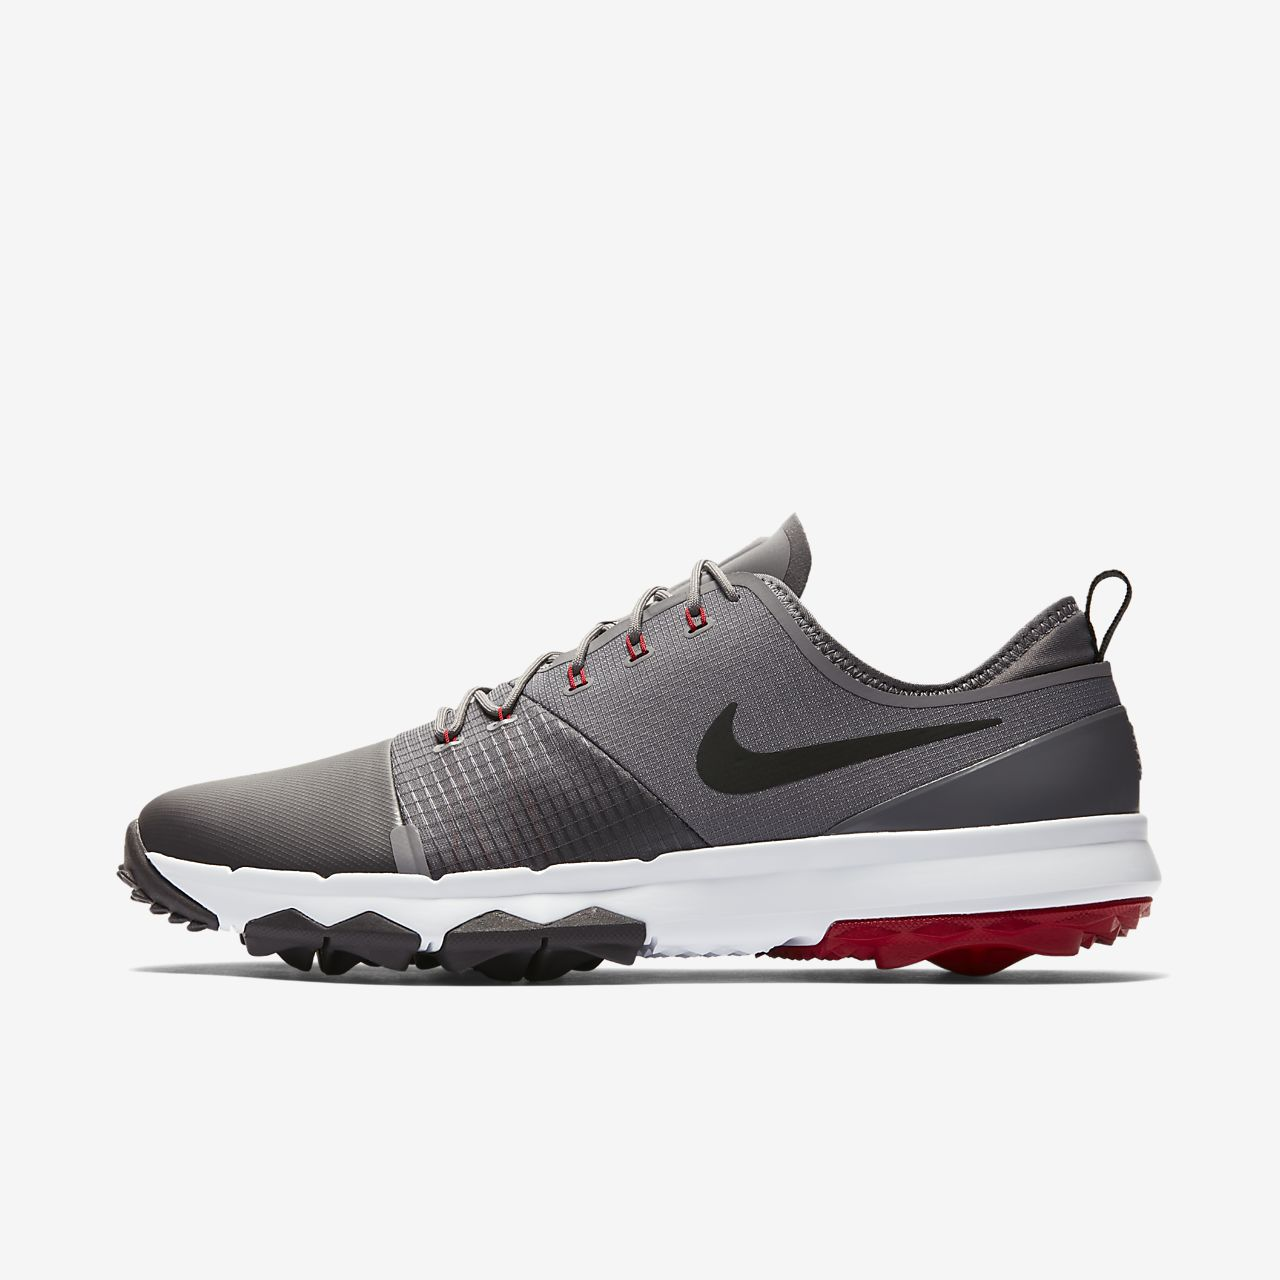 timeless design b5489 e5a9c ... Scarpa da golf Nike FI Impact 3 - Uomo